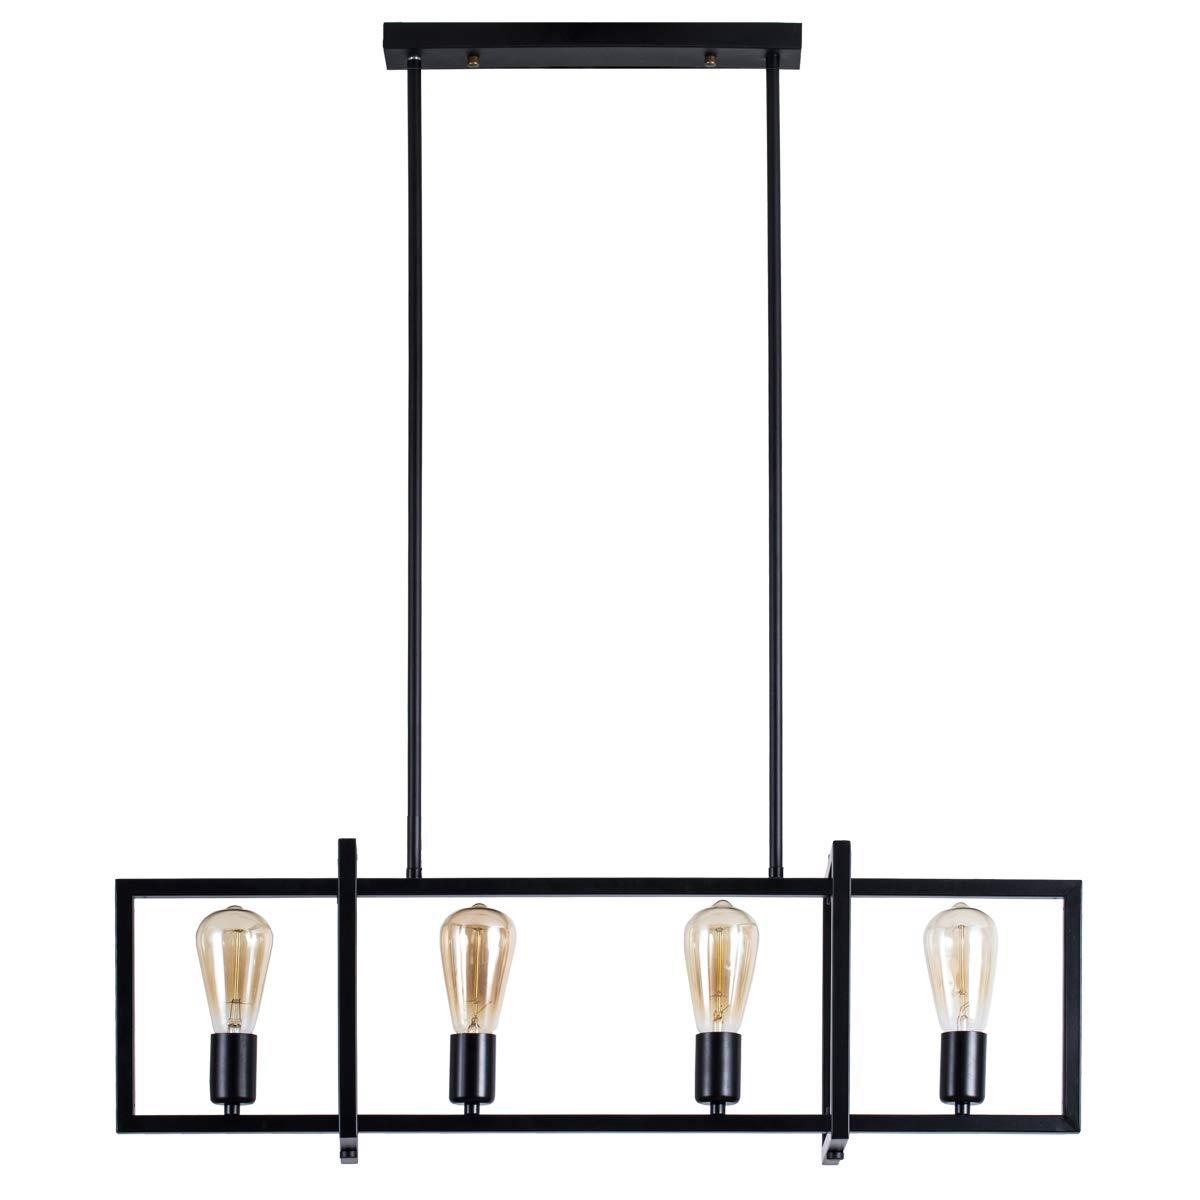 4-Light Kitchen Island Pendant with Matte Black Plated Finish, Geometric Modern Industrial Chandelier Lighting Fixture for Kitchen Island, Restaurants, Dining Room, Hotels, Foyer, Shops